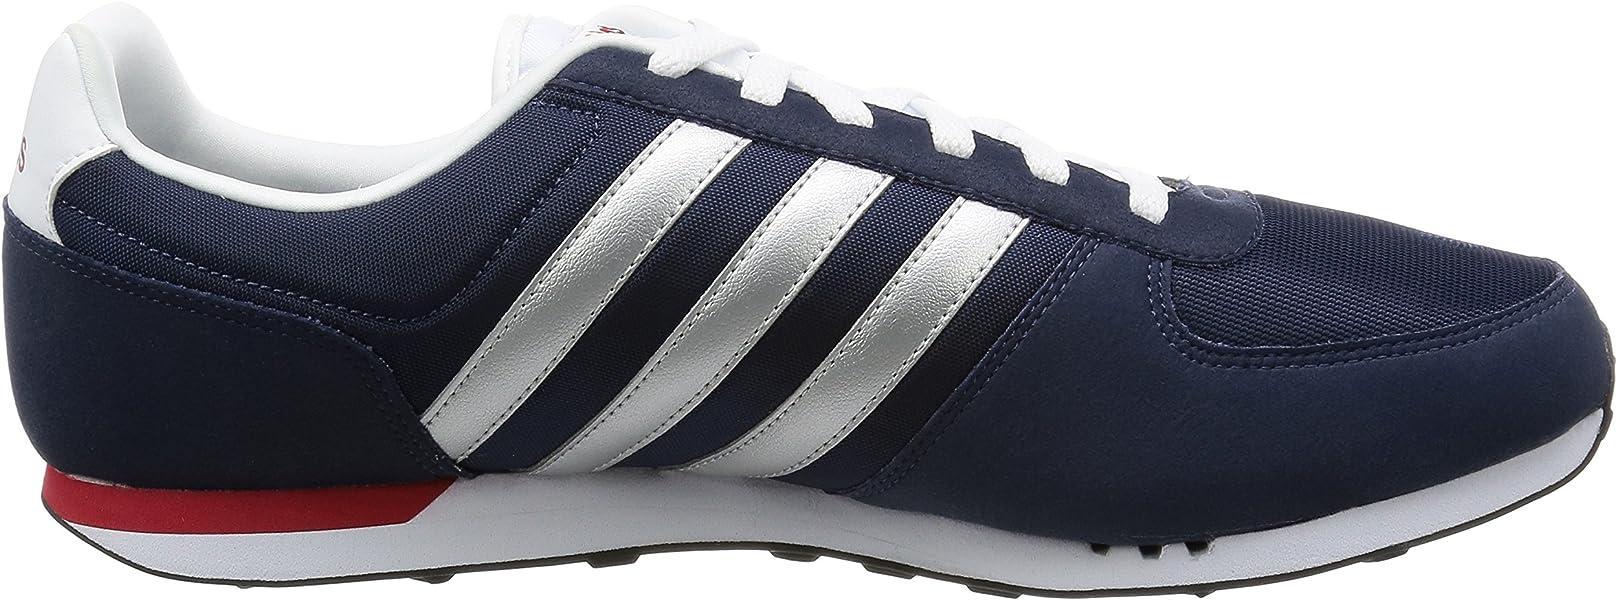 97b72e77d510b adidas Shoes NEO City Racer F99330 Marino - Amazon Mỹ | Fado.vn